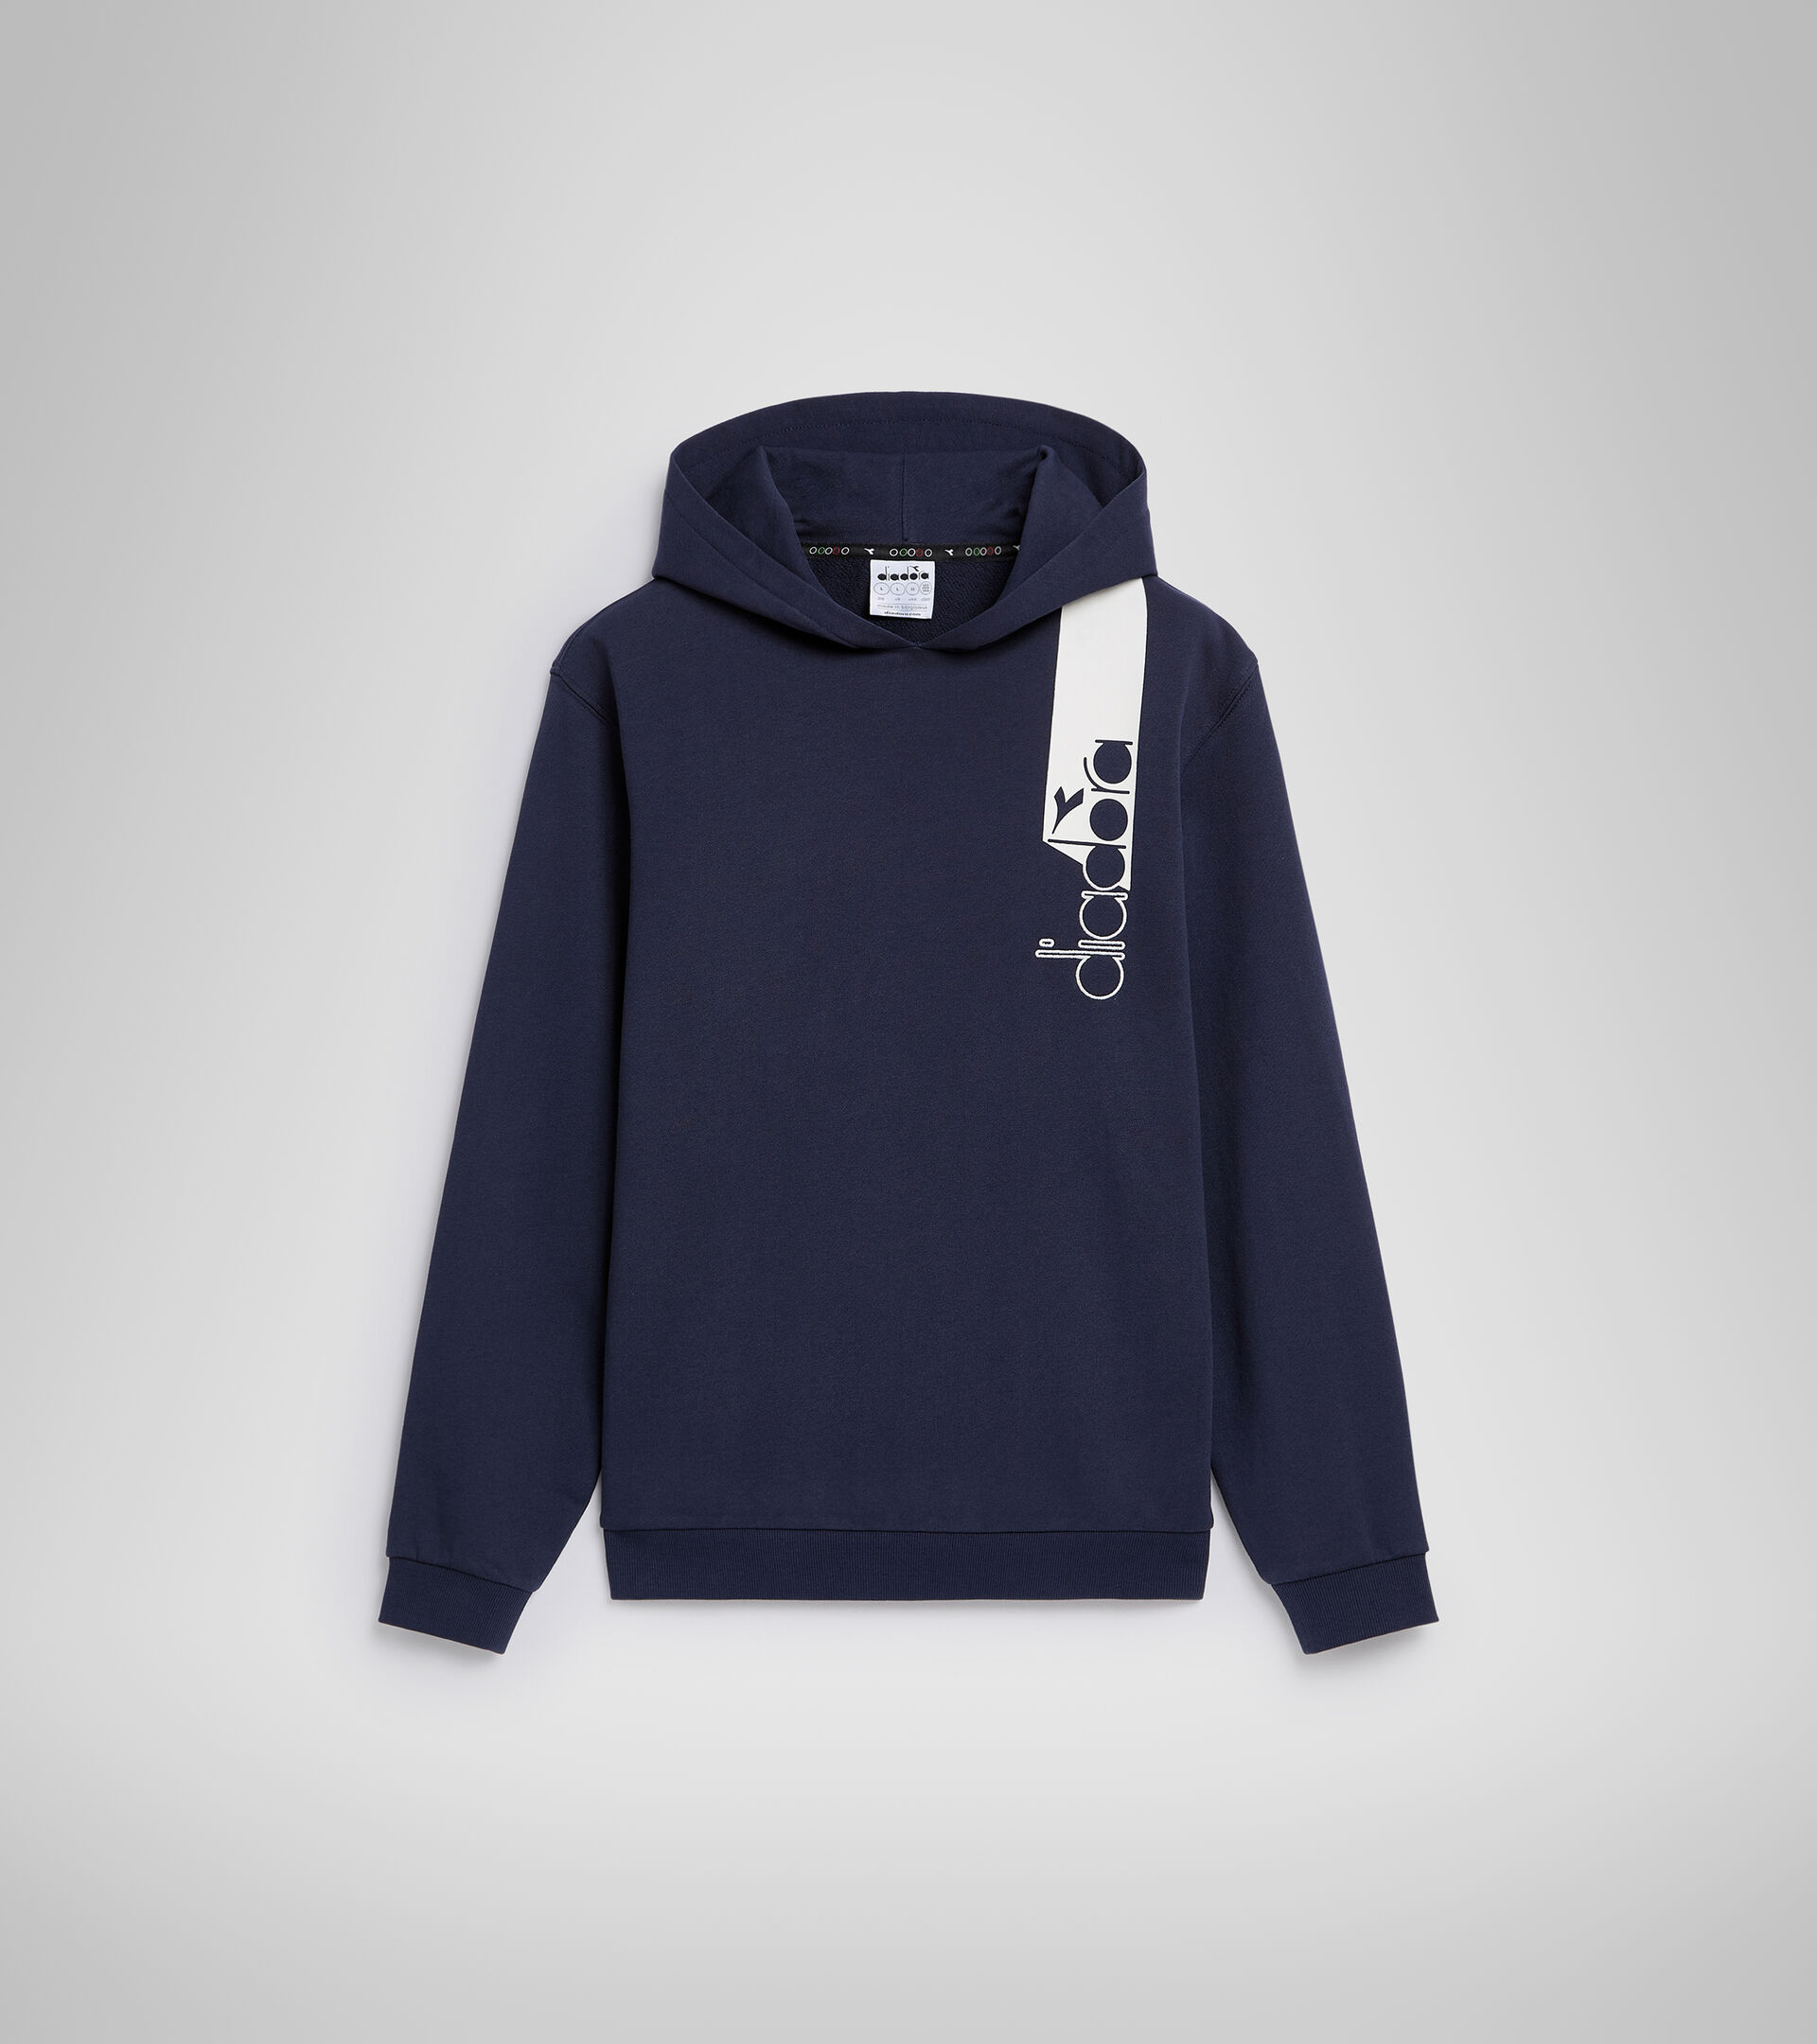 Apparel Sportswear UOMO HOODIE ICON CLASSIC NAVY Diadora